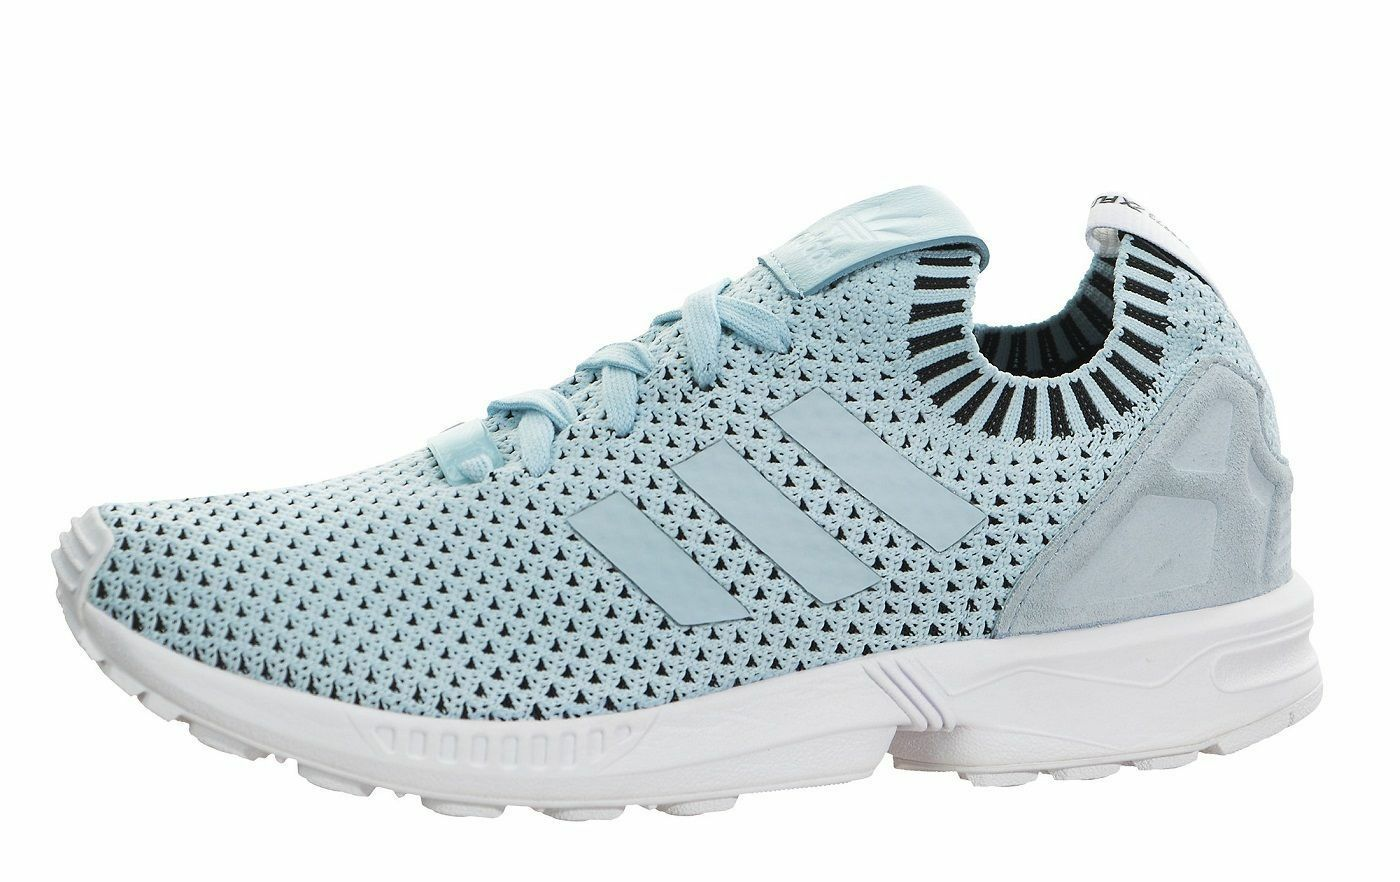 Adidas originals zx - flux - pk casual primeknit eis Blau casual pk schuhen sz 10,5 s75973 604b5e